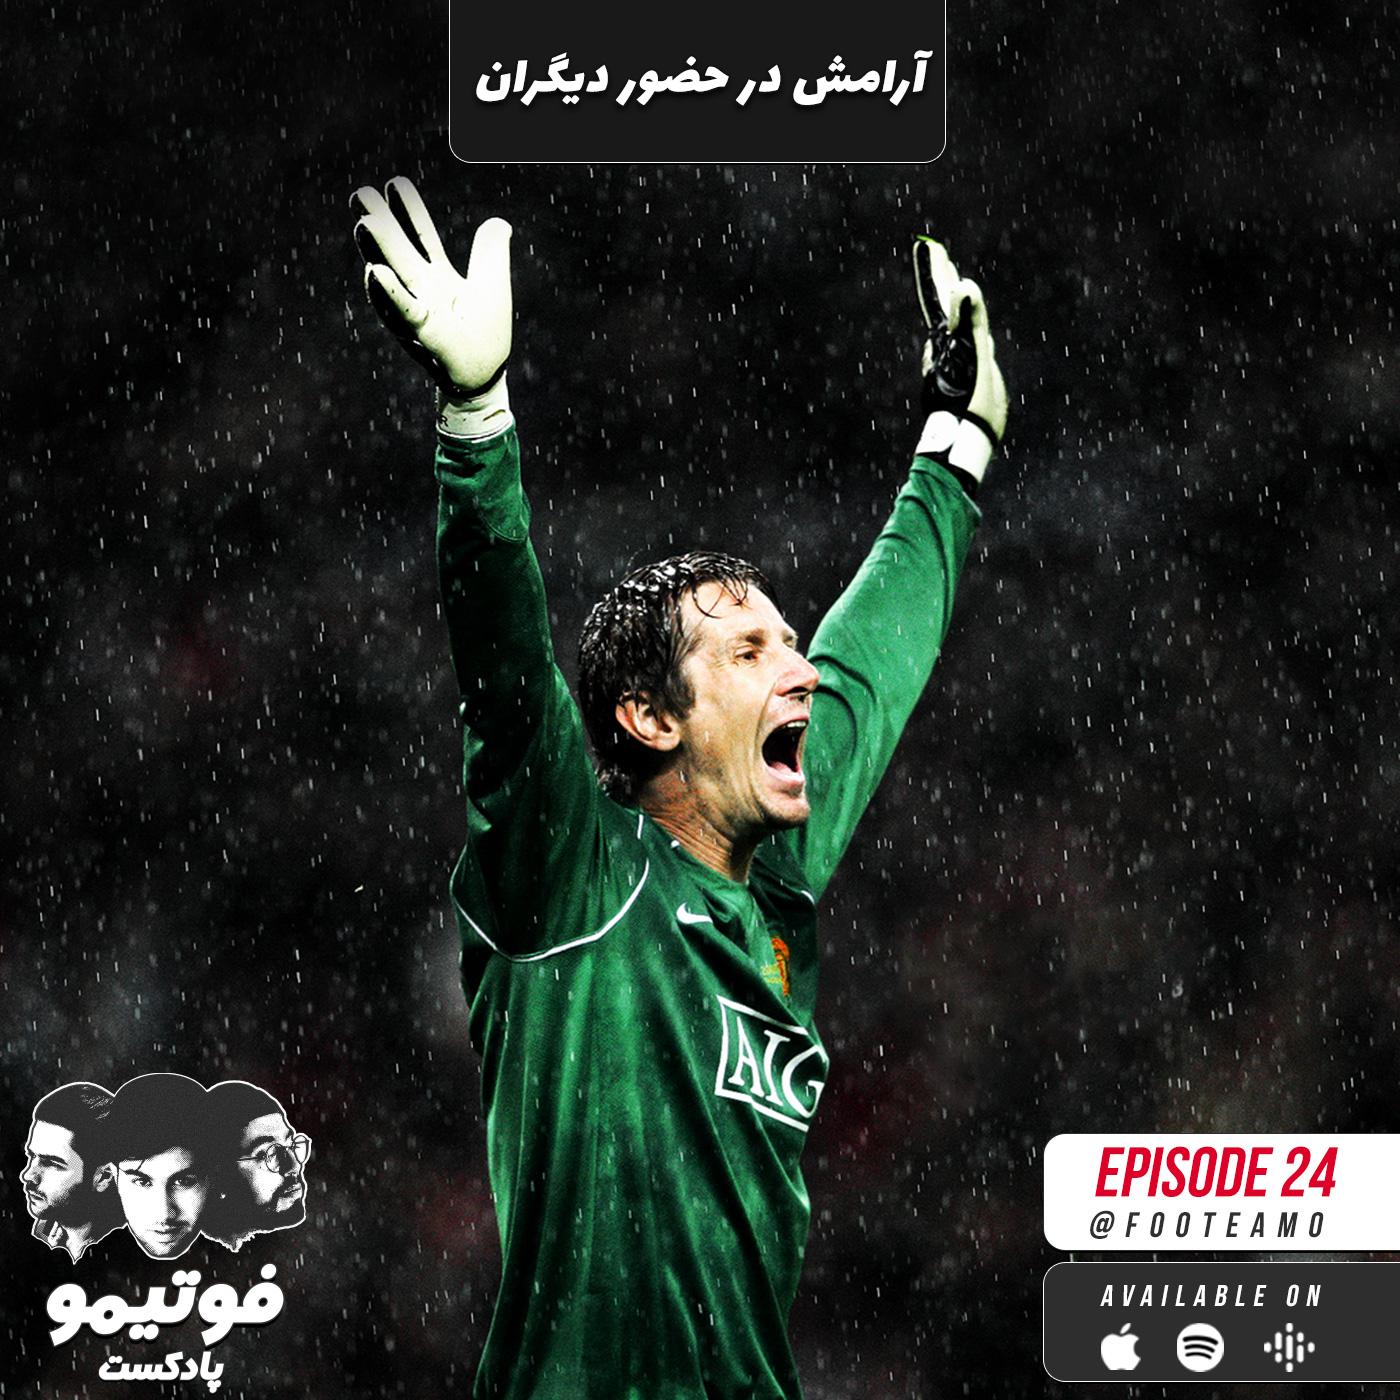 Poster Episode24 پادکست فوتبالی فوتیمو